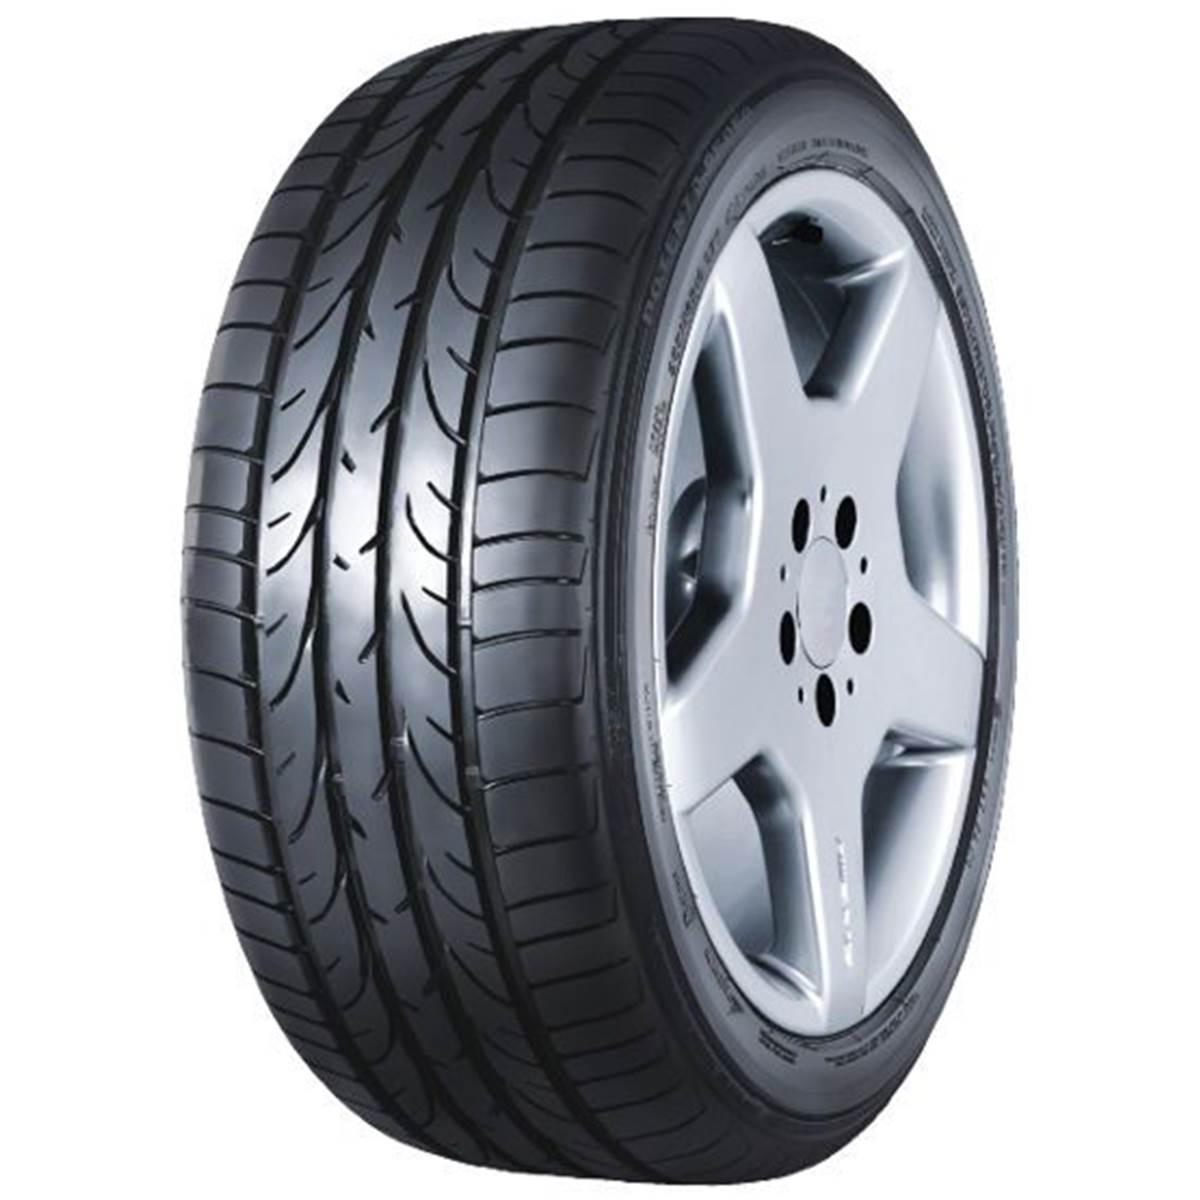 Pneu Bridgestone 225/45R17 91W Potenza Re050